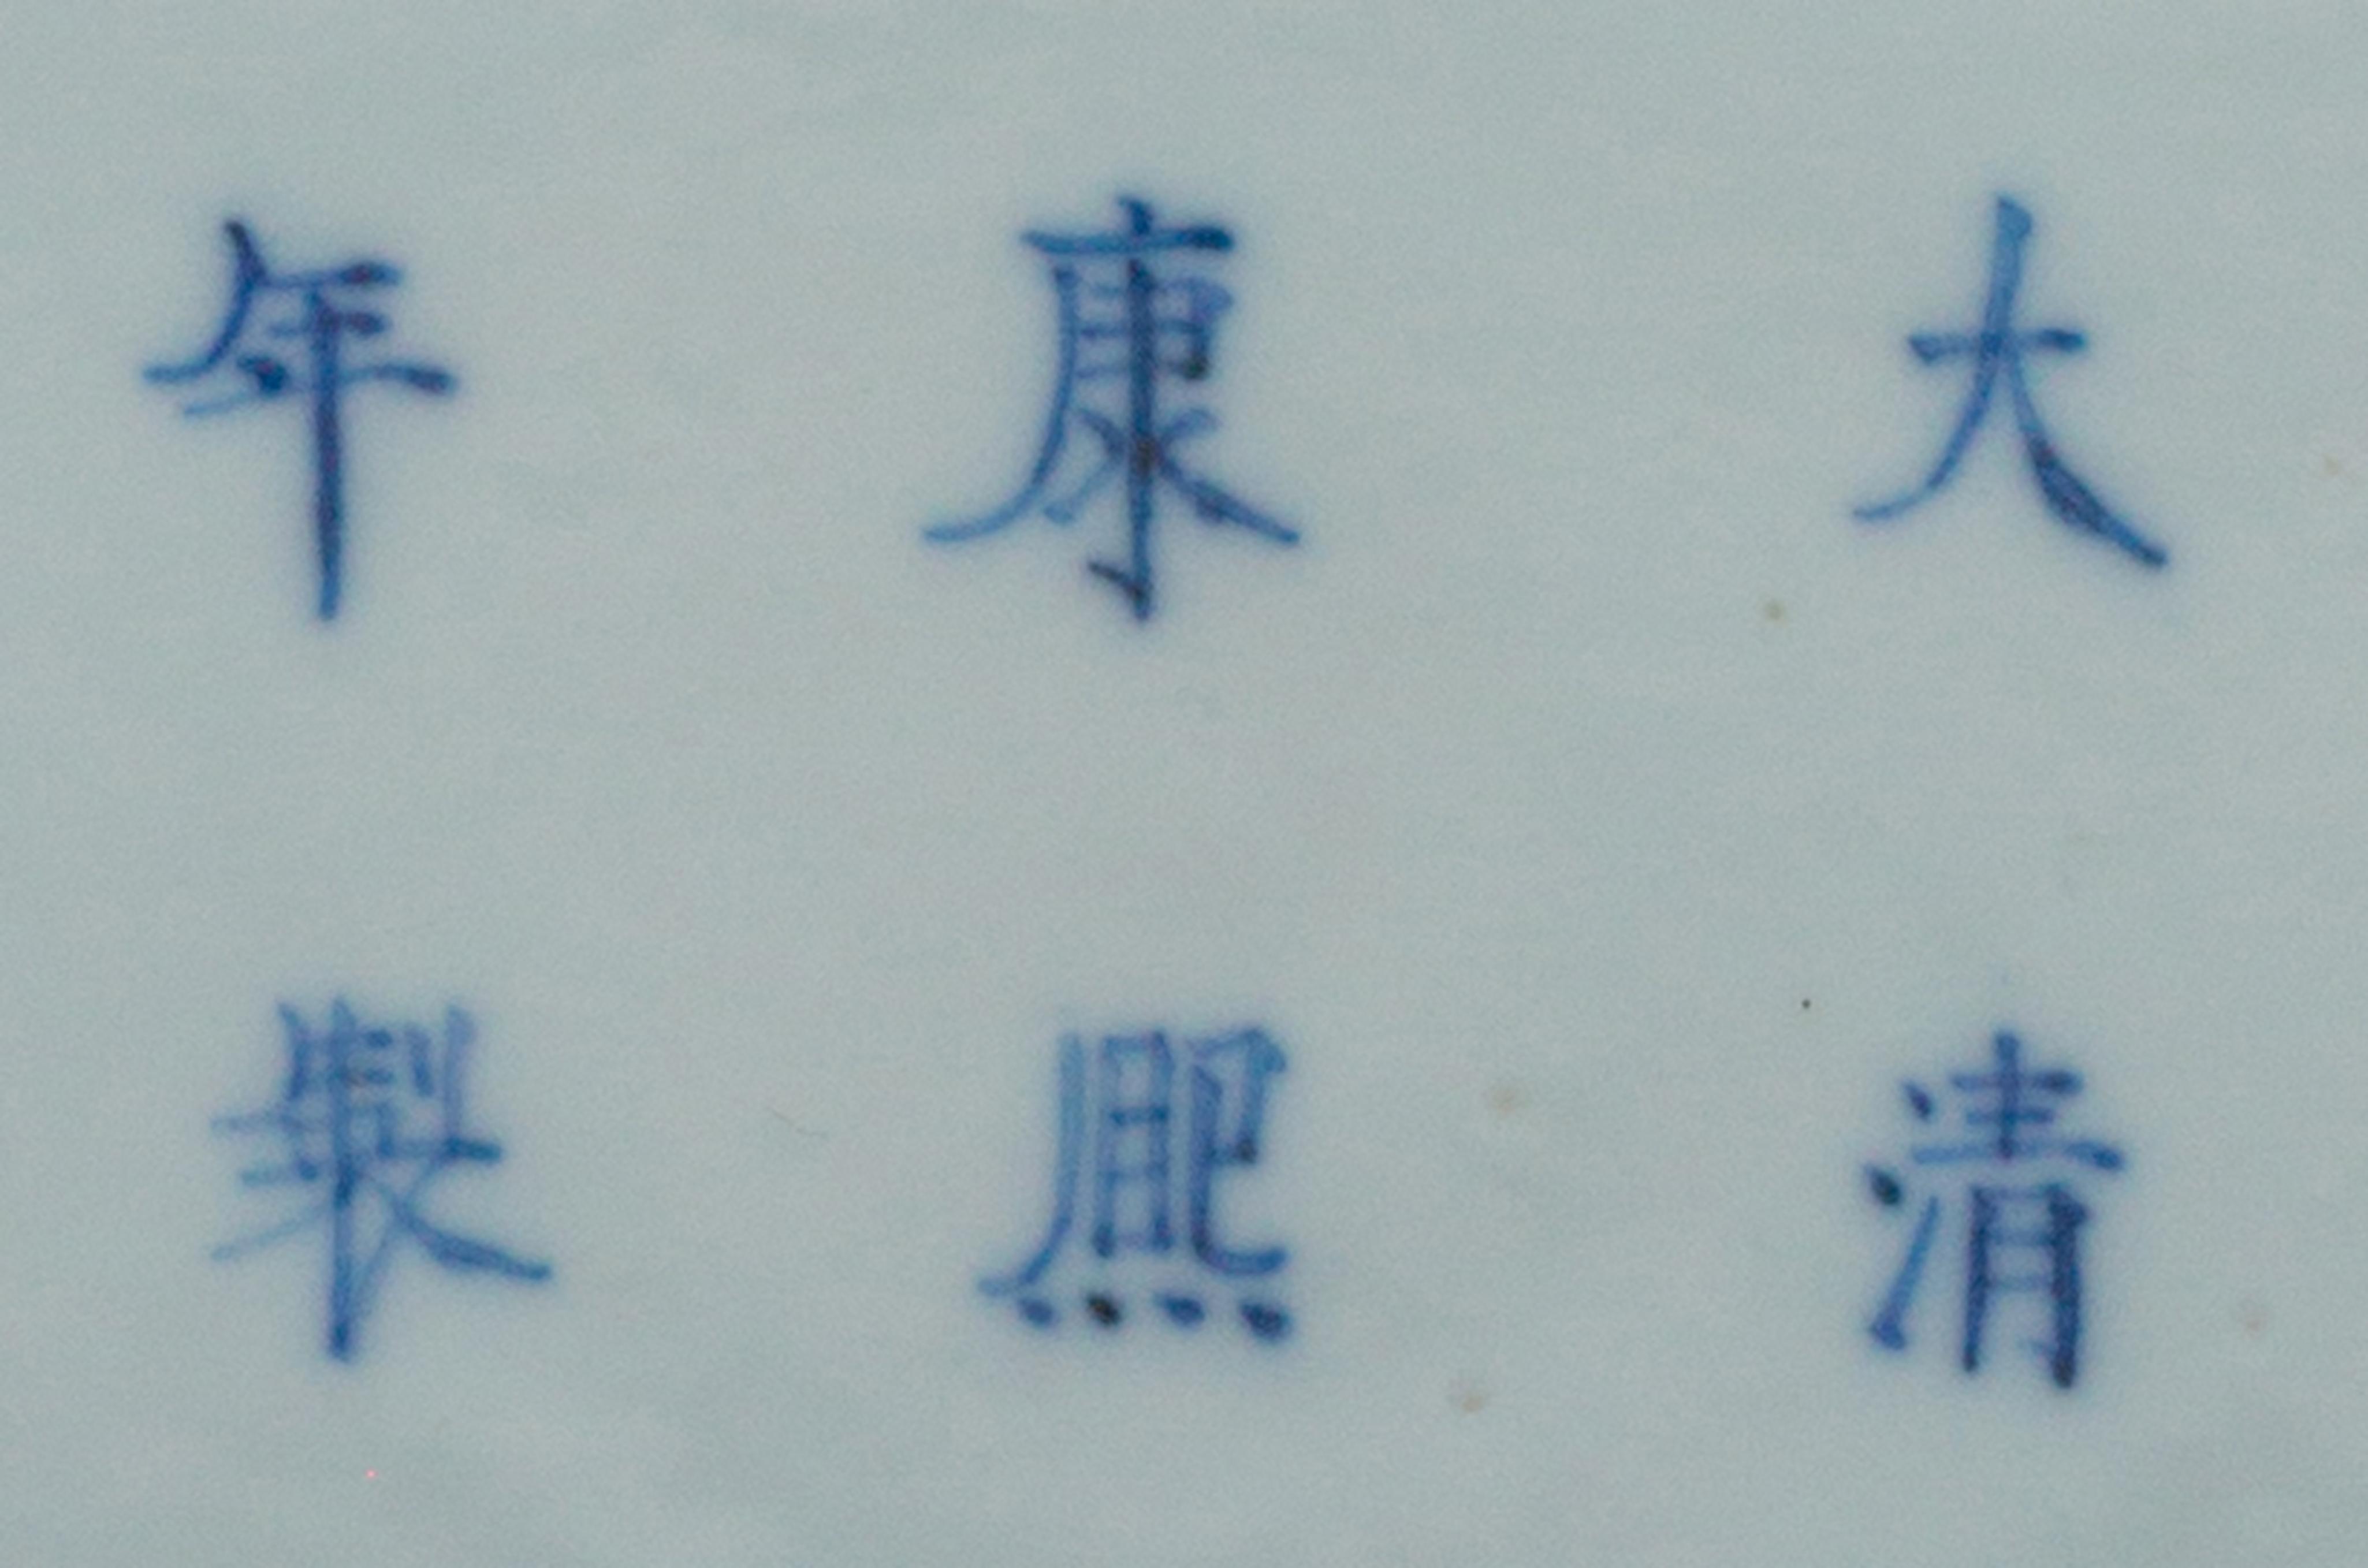 Lot 16 - A peachbloom-glazed beehive waterpot, 'Taibaizun', Kangxi six-character mark and of the period